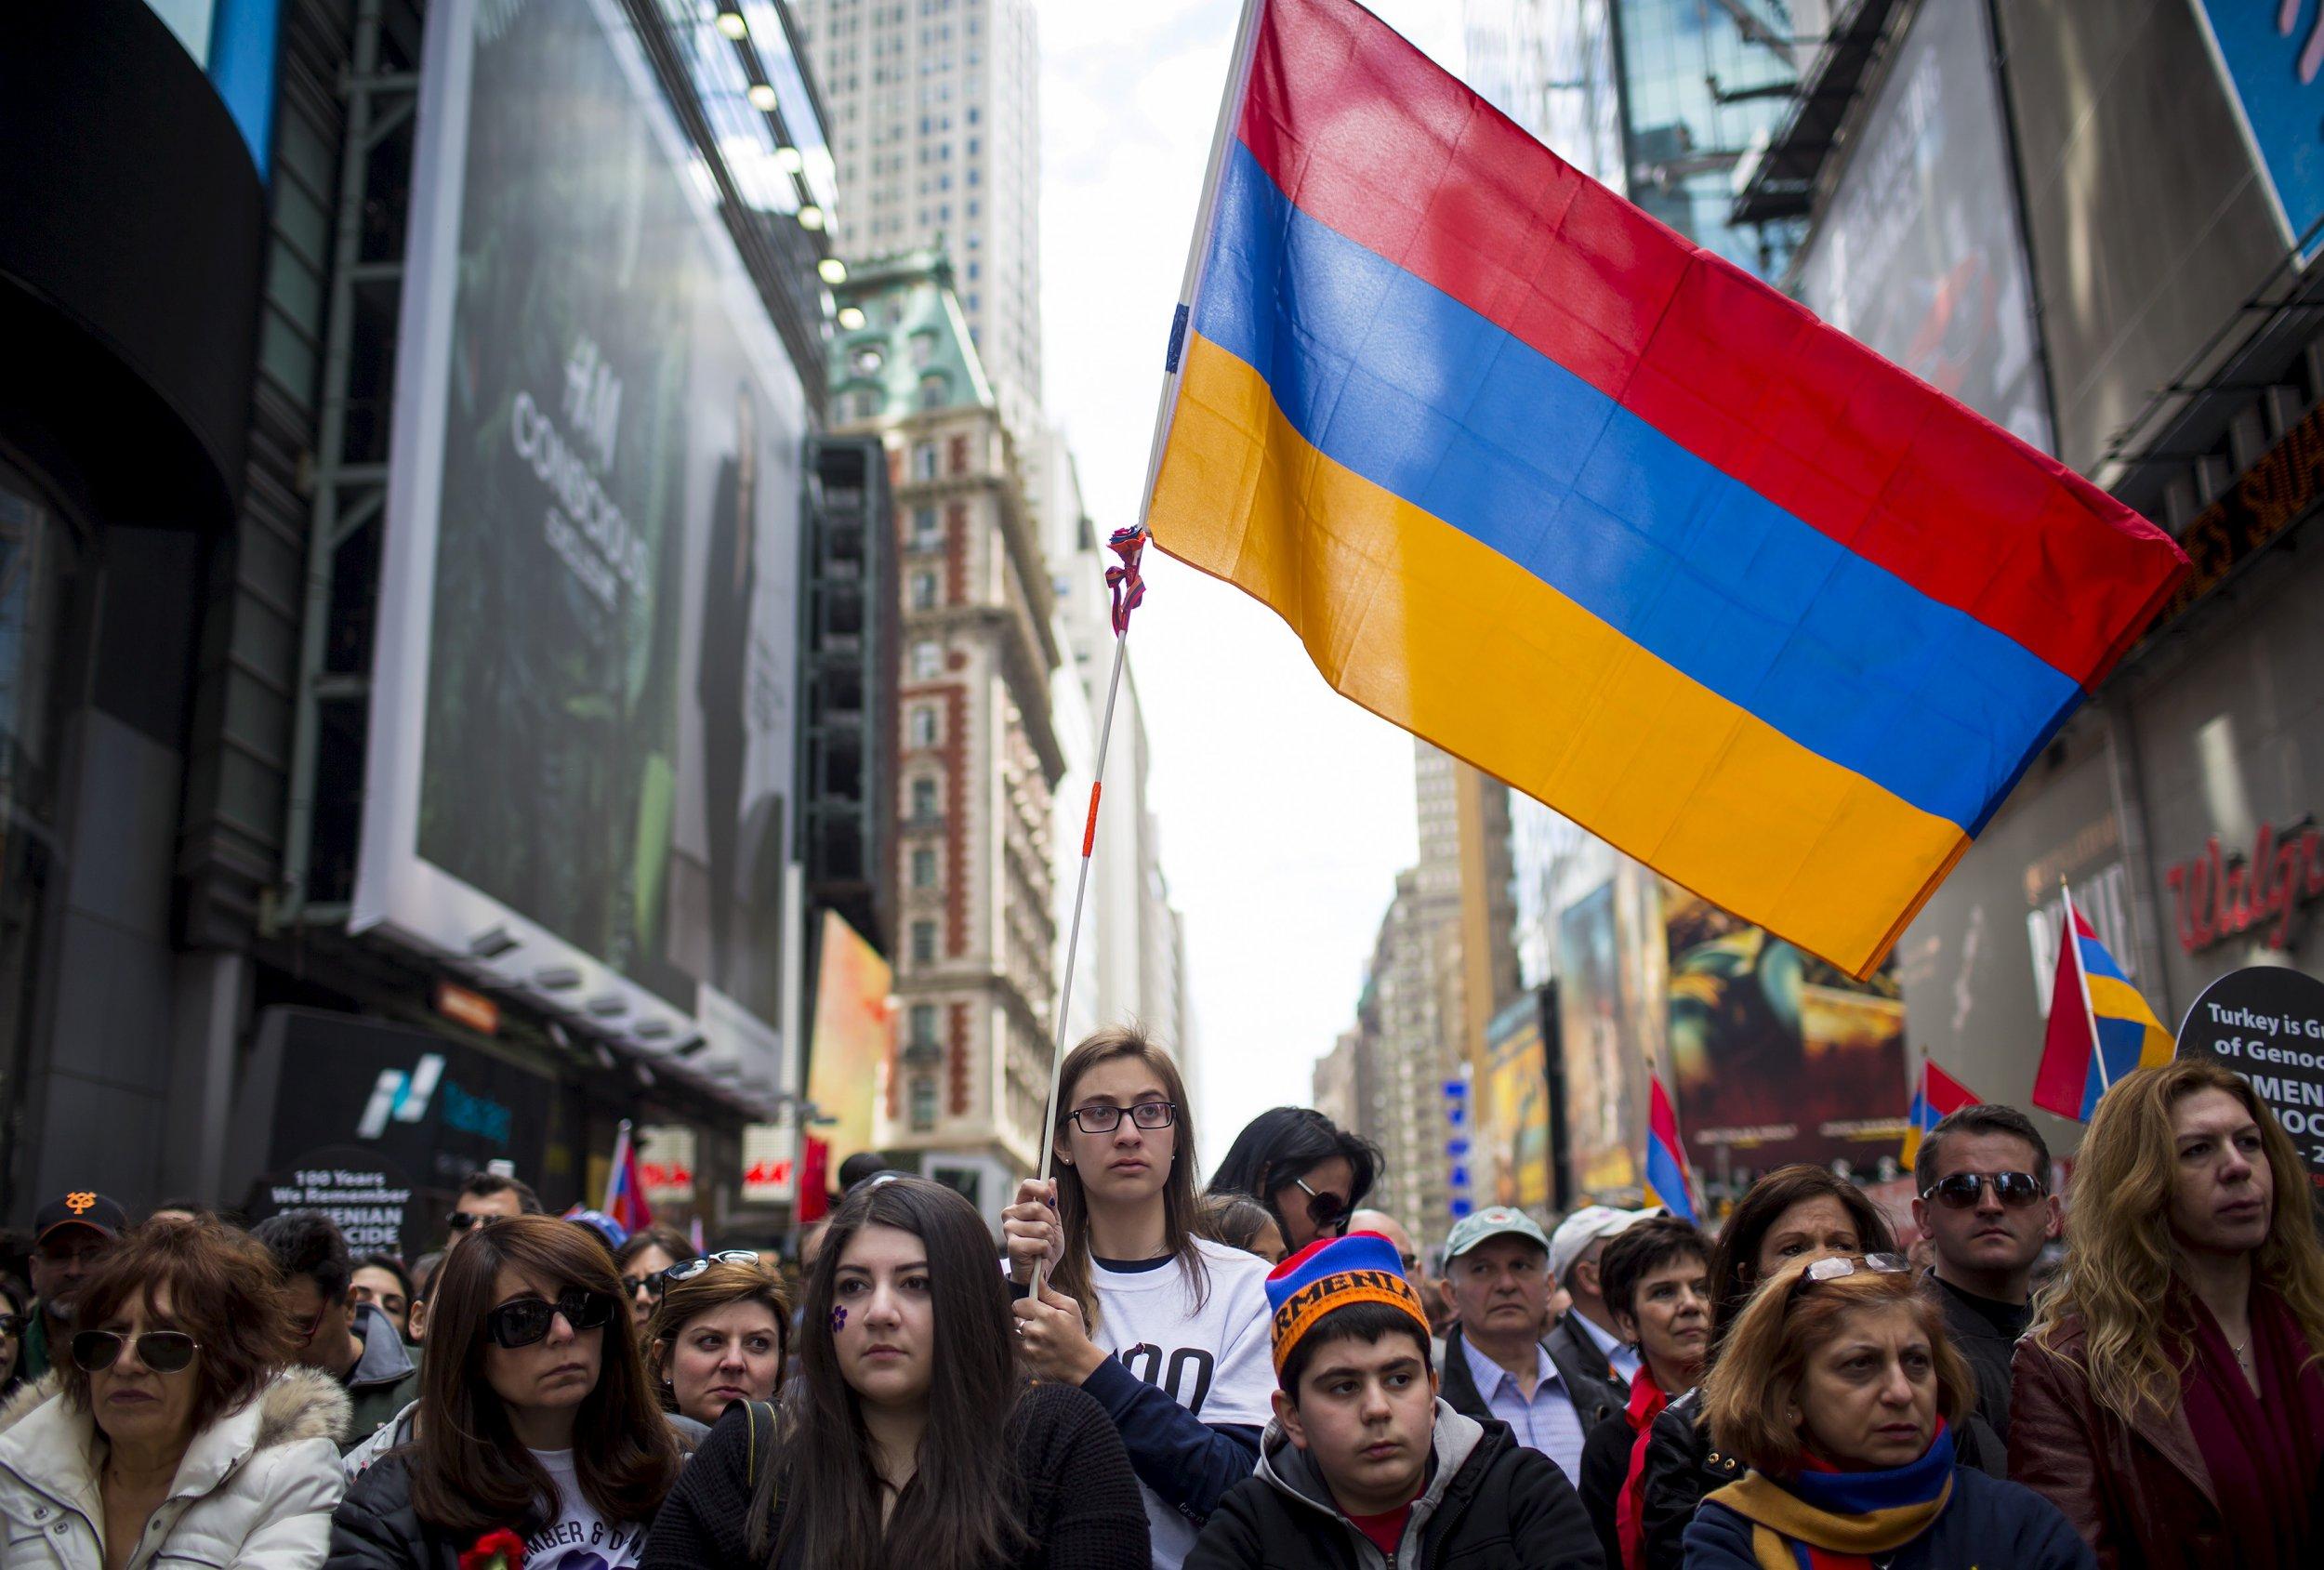 4-21-16 Armenian genocide commemoration